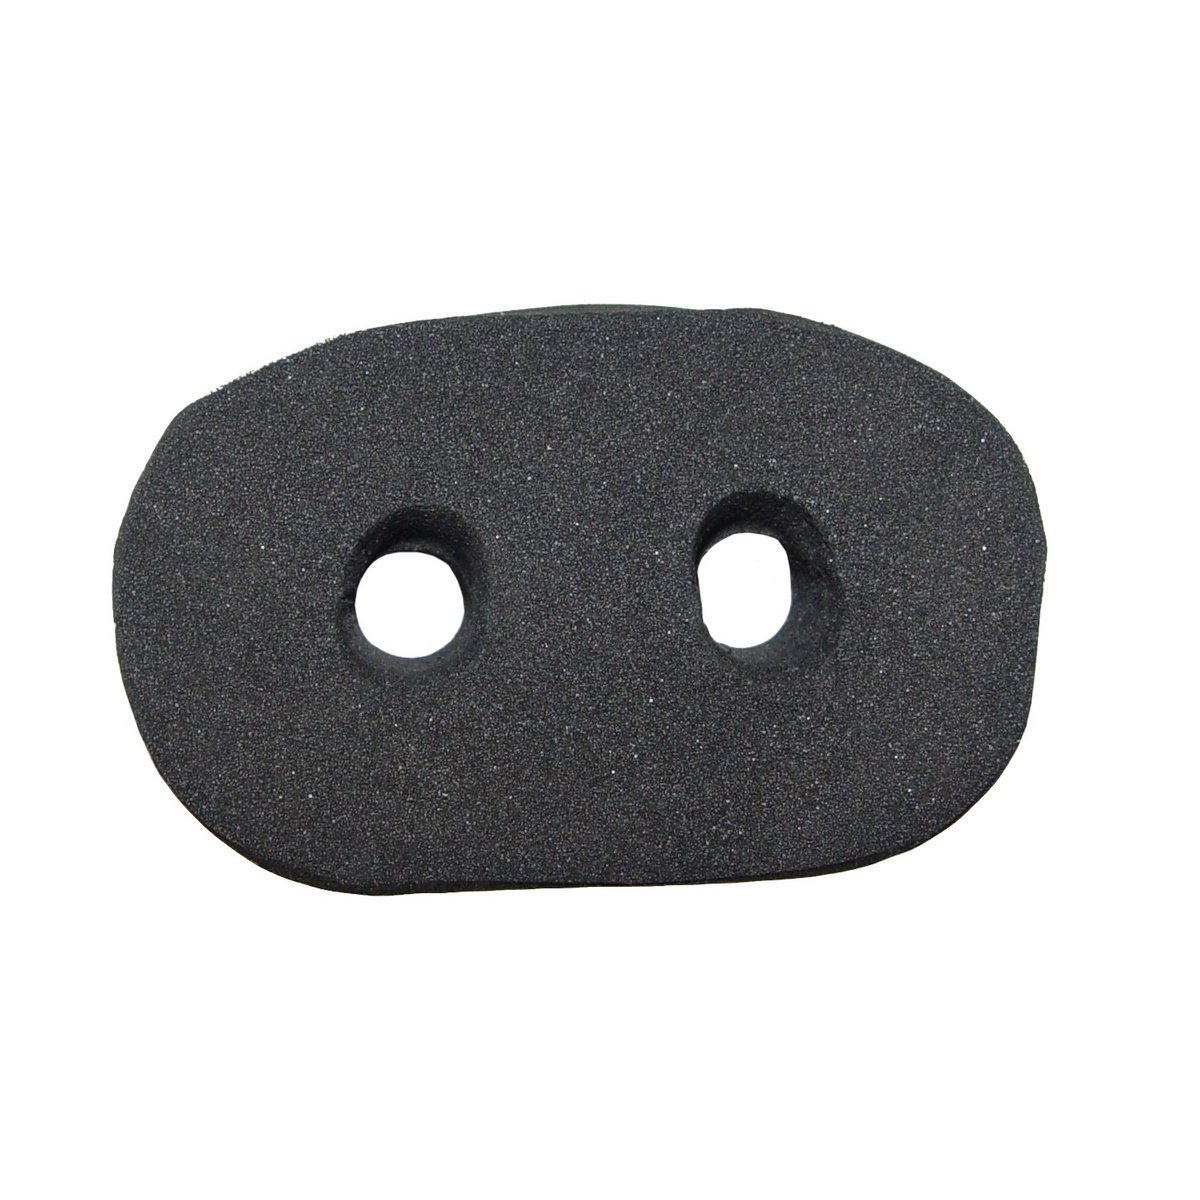 Omix-Ada 17908.01 Heater Core Tube Seal